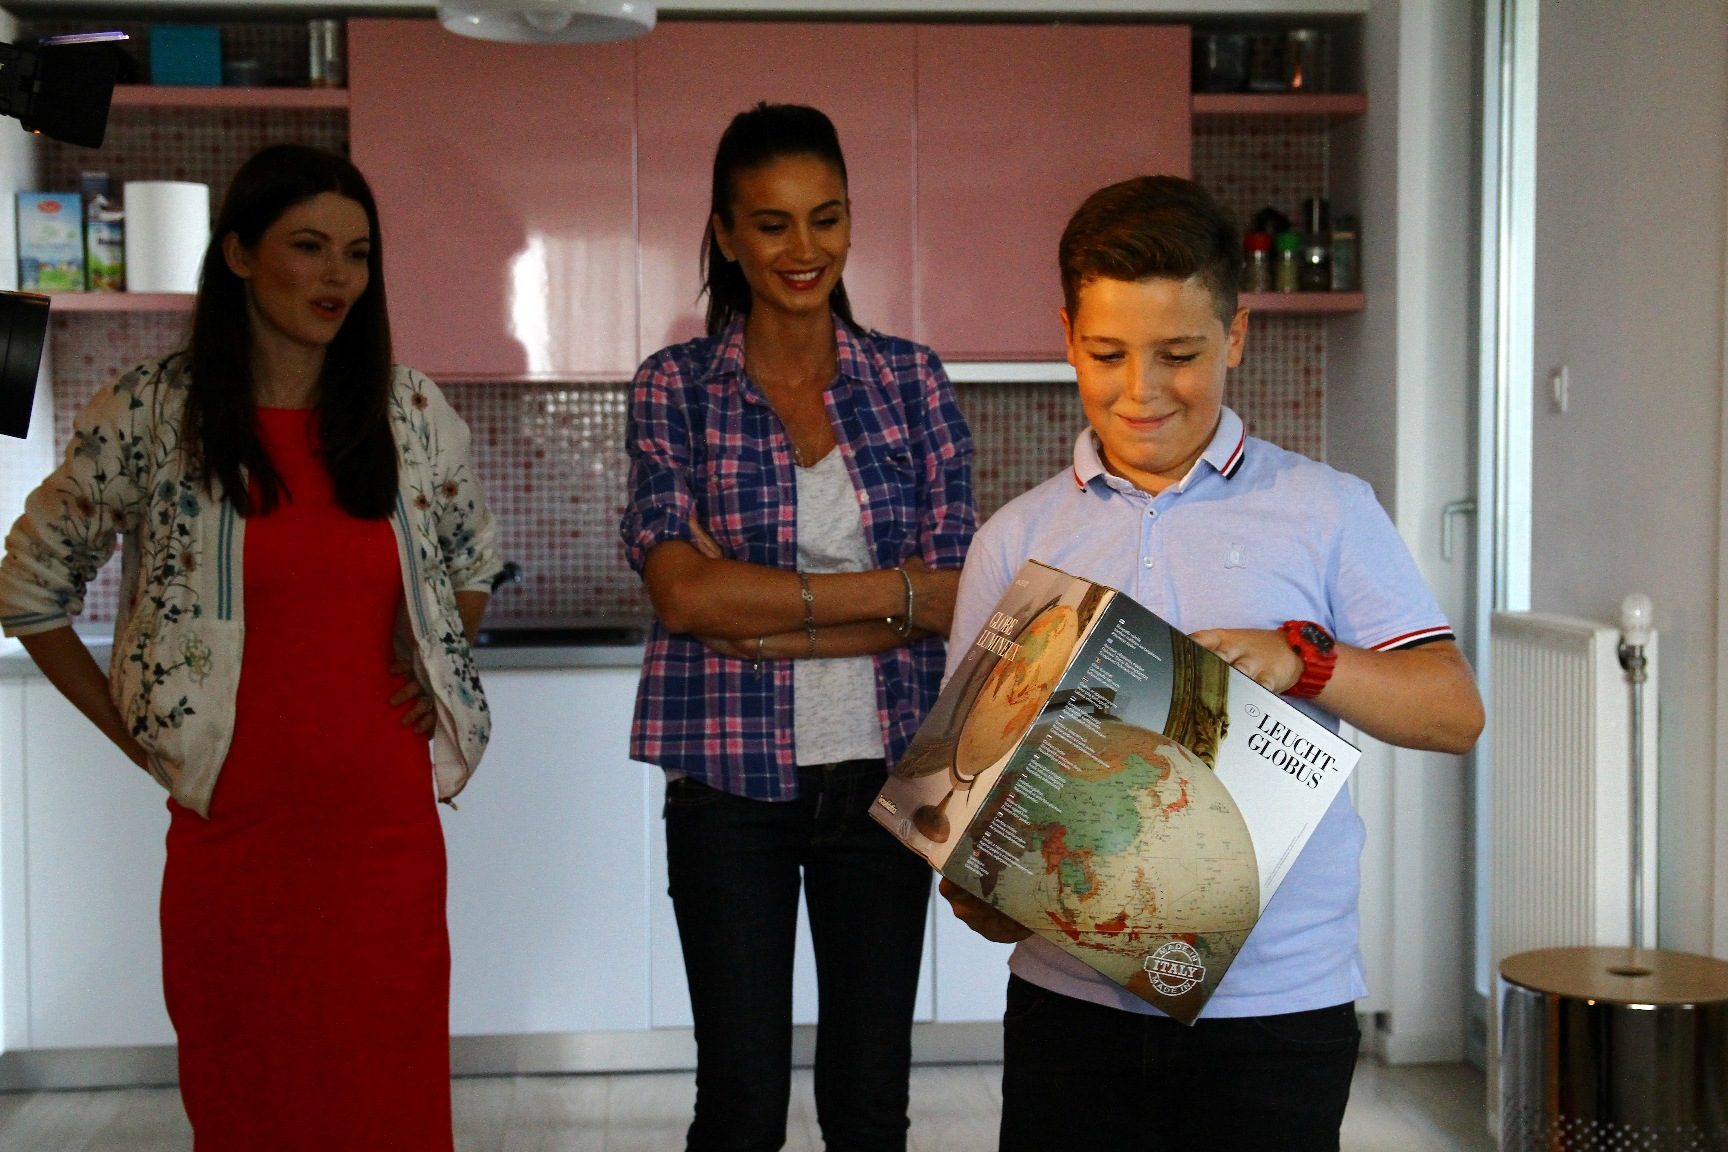 Geanina Varga, arata mai bine la Antena 1 decat la Prima TV